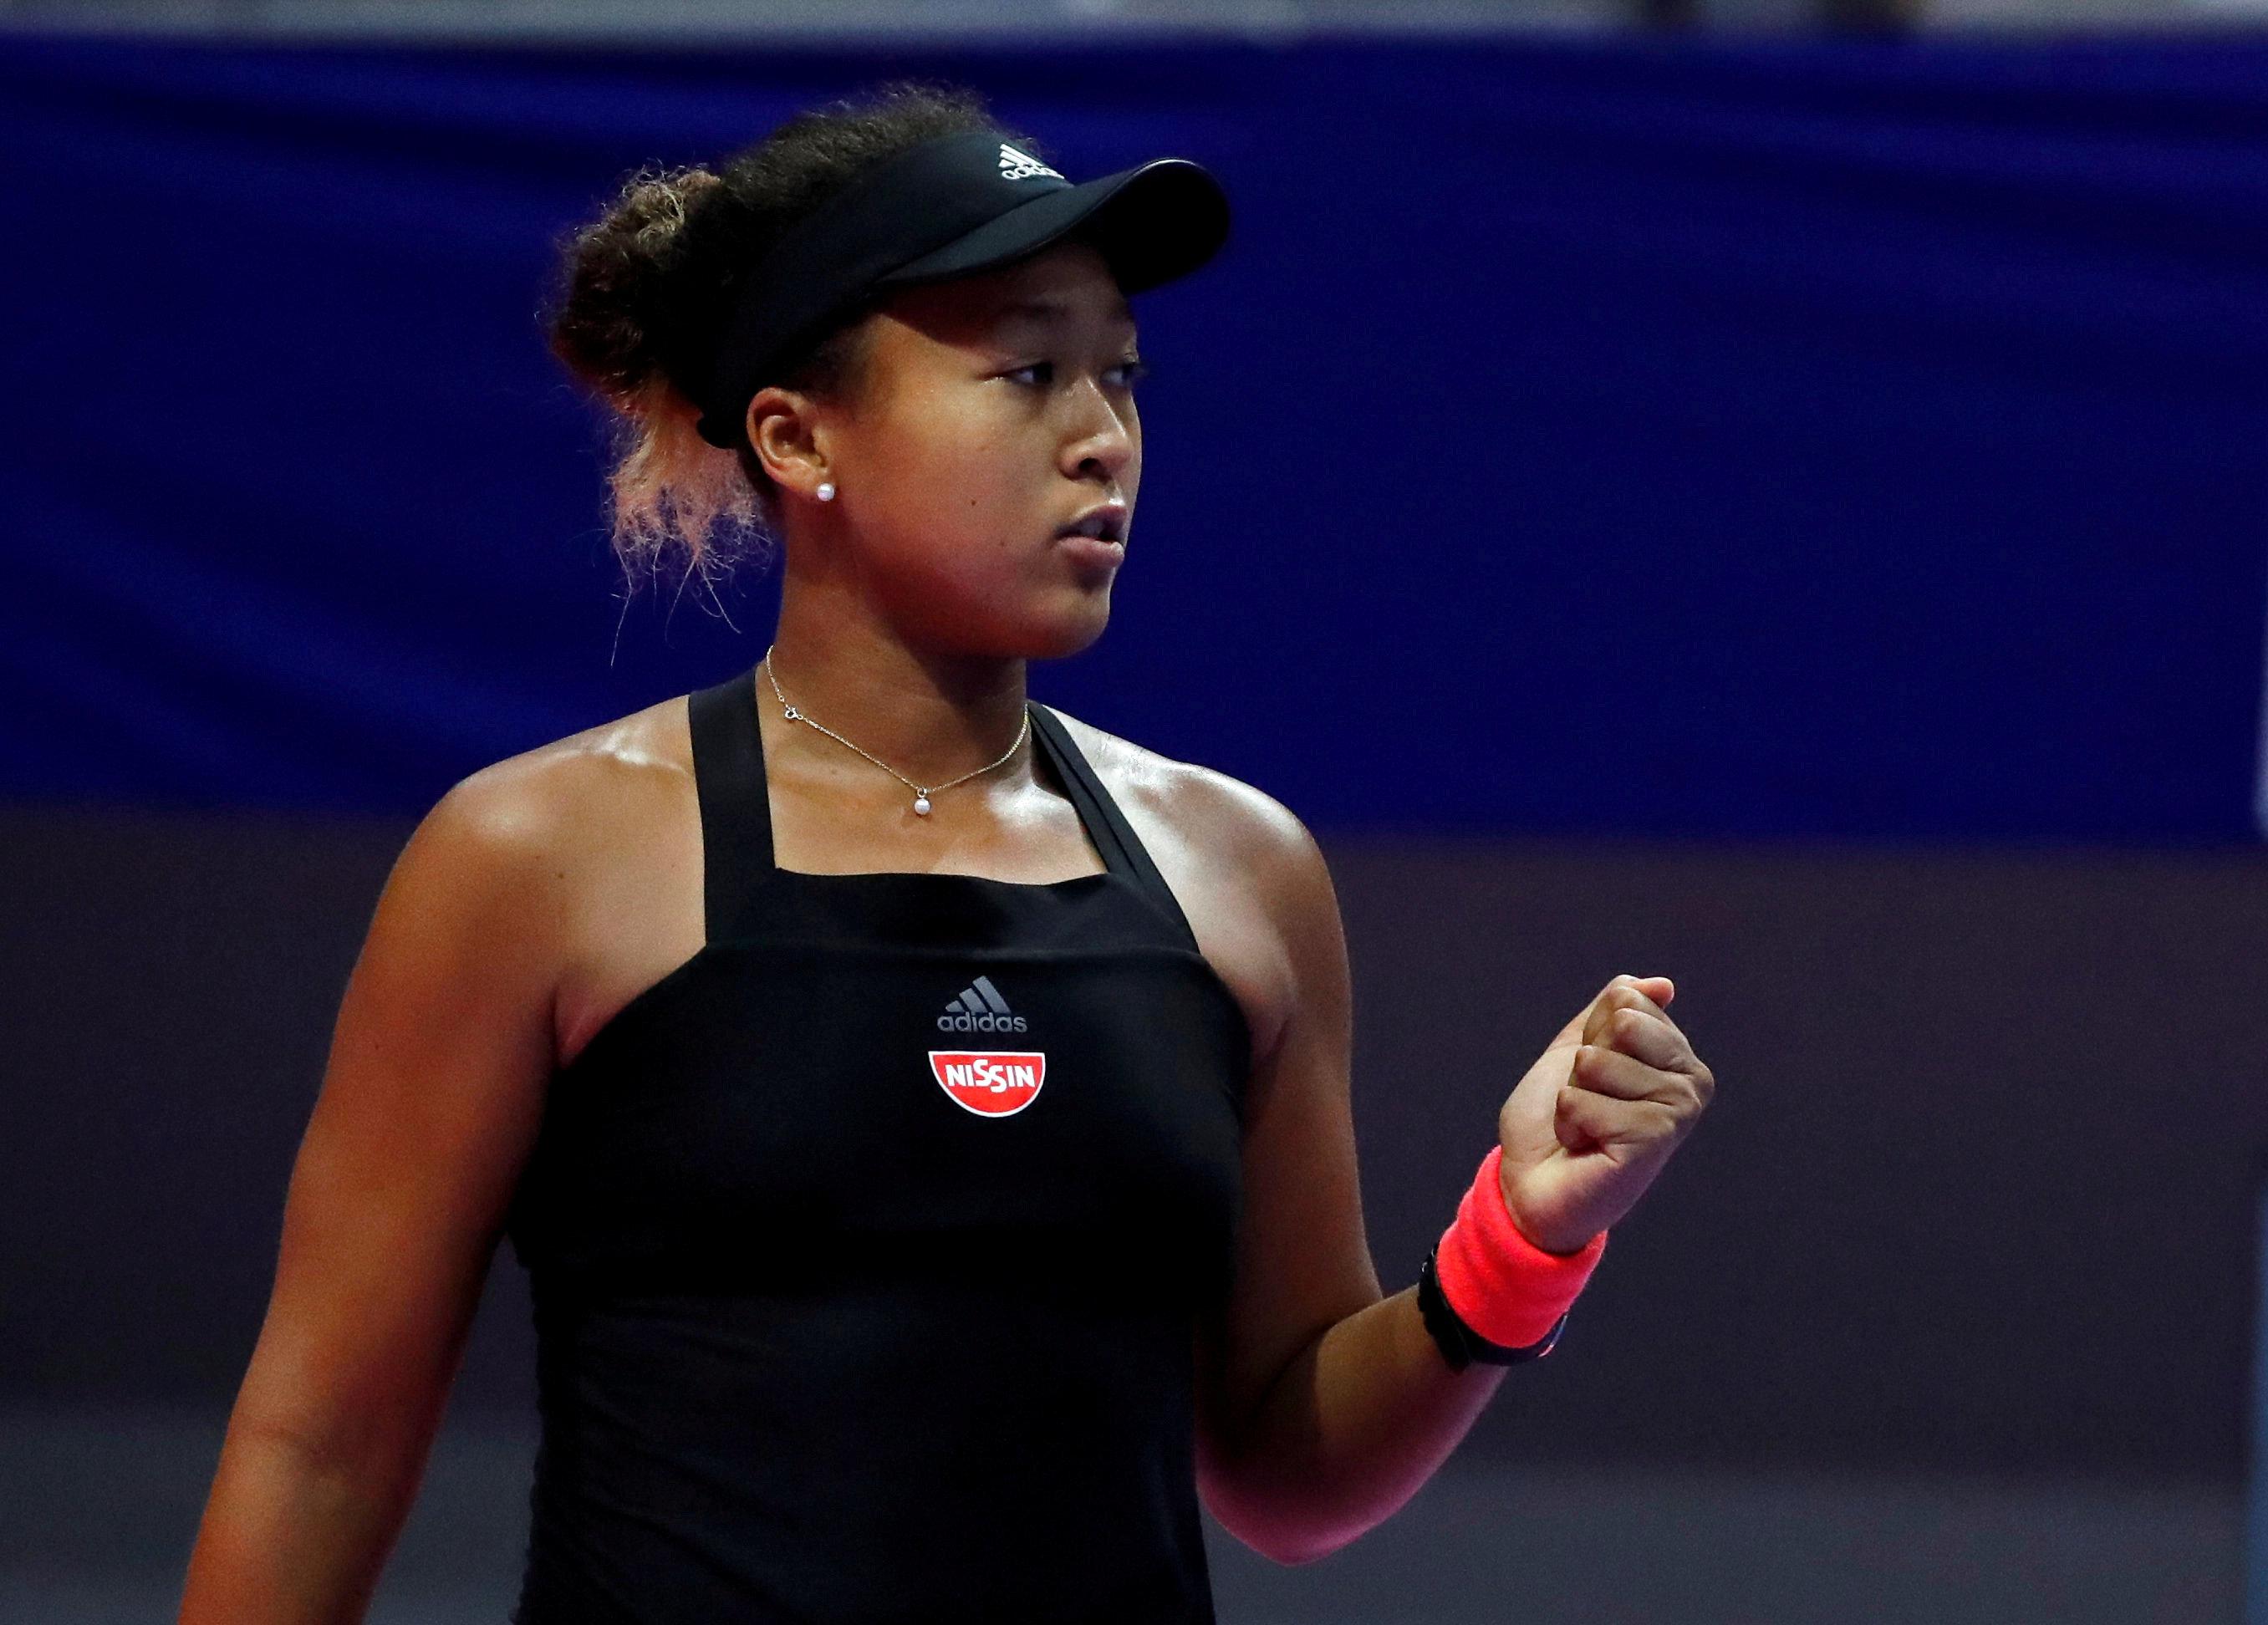 Tennis: Osaka becomes third player to secure WTA Finals berth